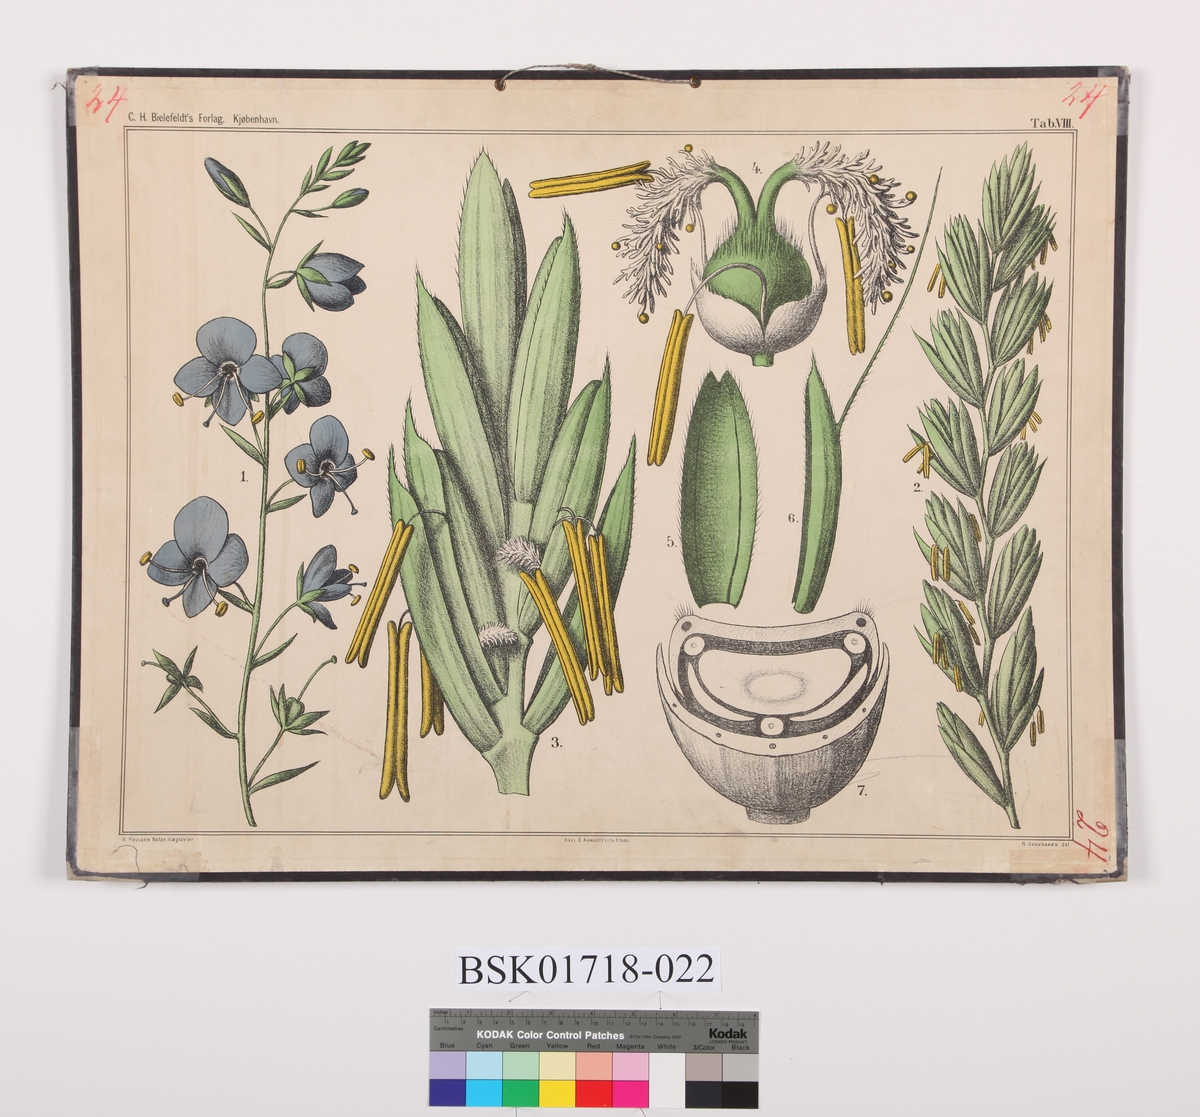 Blomst. Veronika-støvbærere